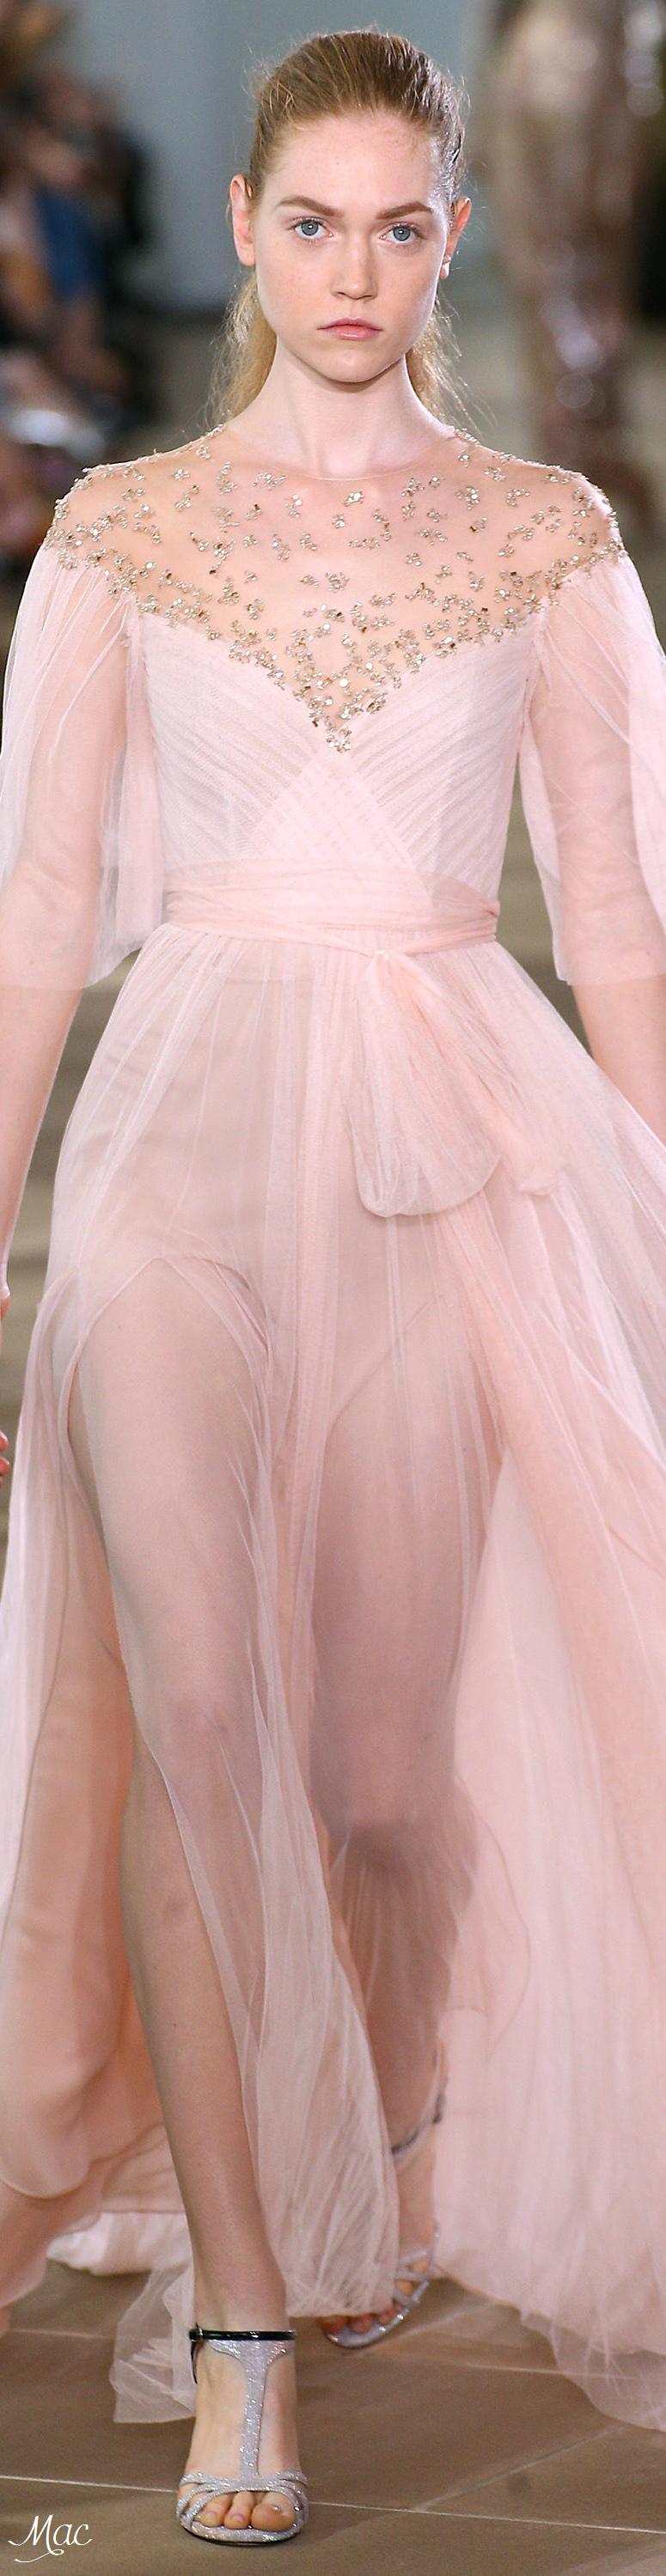 Spring 2017 Ready-to-Wear Monique Lhuillier | details | Pinterest ...